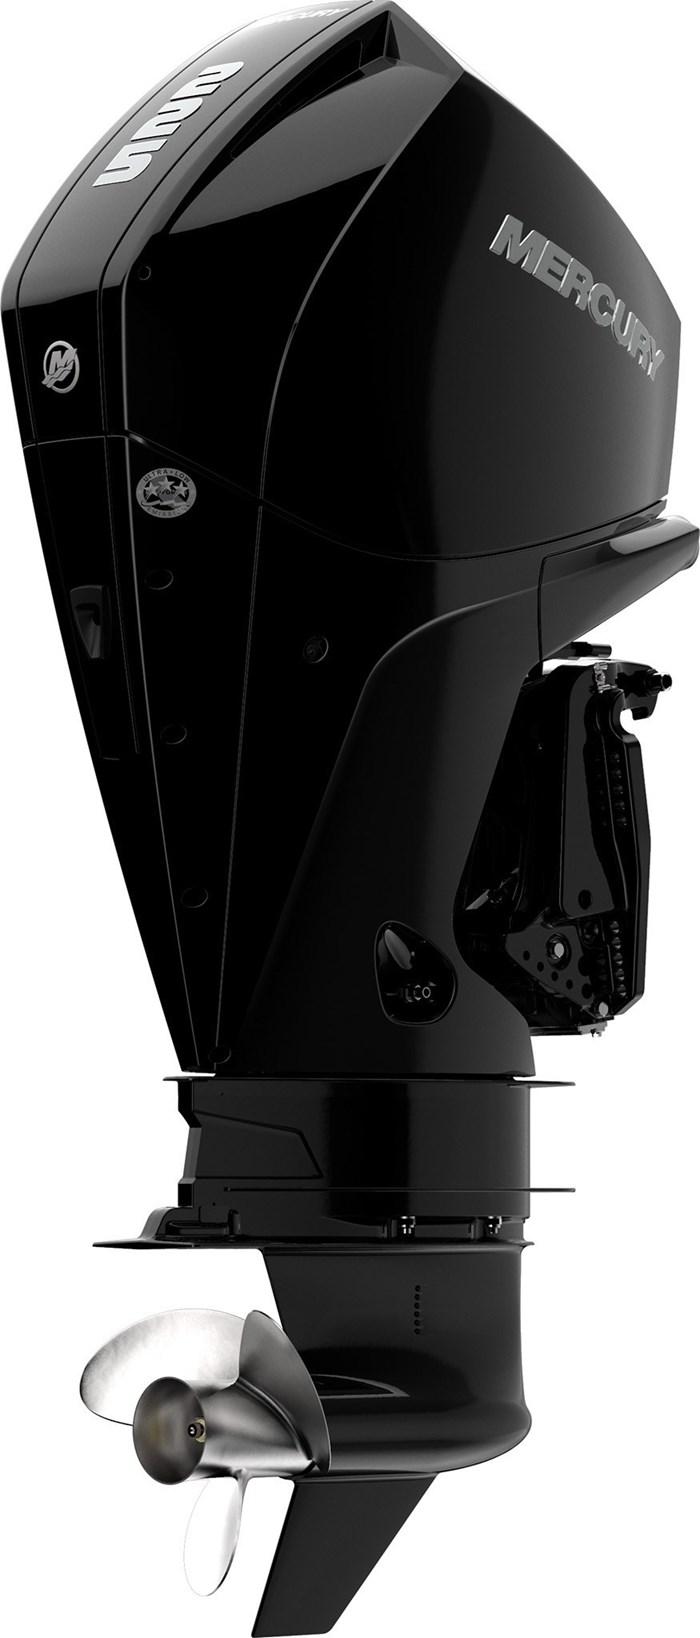 2022 Mercury 225XL V-6 4-Stroke DTS Photo 11 sur 24